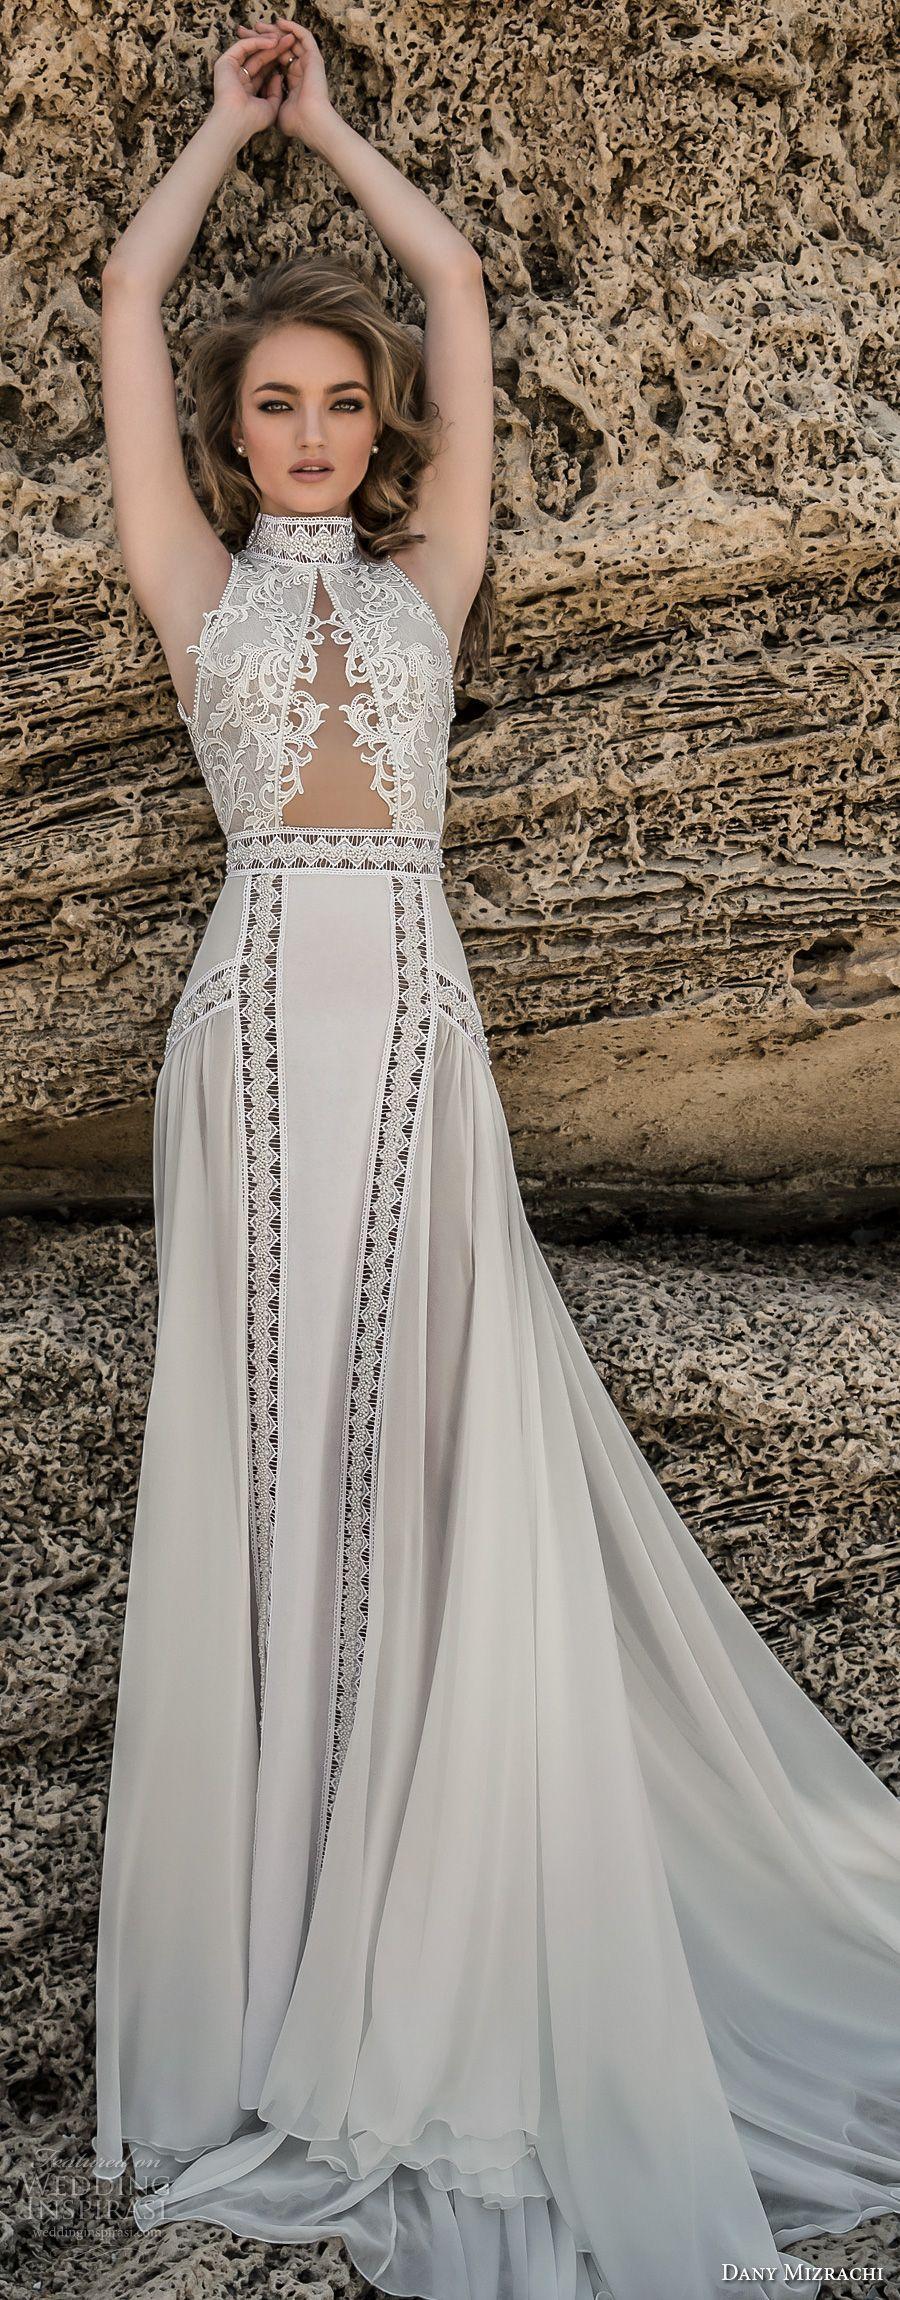 High neck wedding dresses  Pin by Jane Lehane on Wedding Dresses  Pinterest  Chapel train